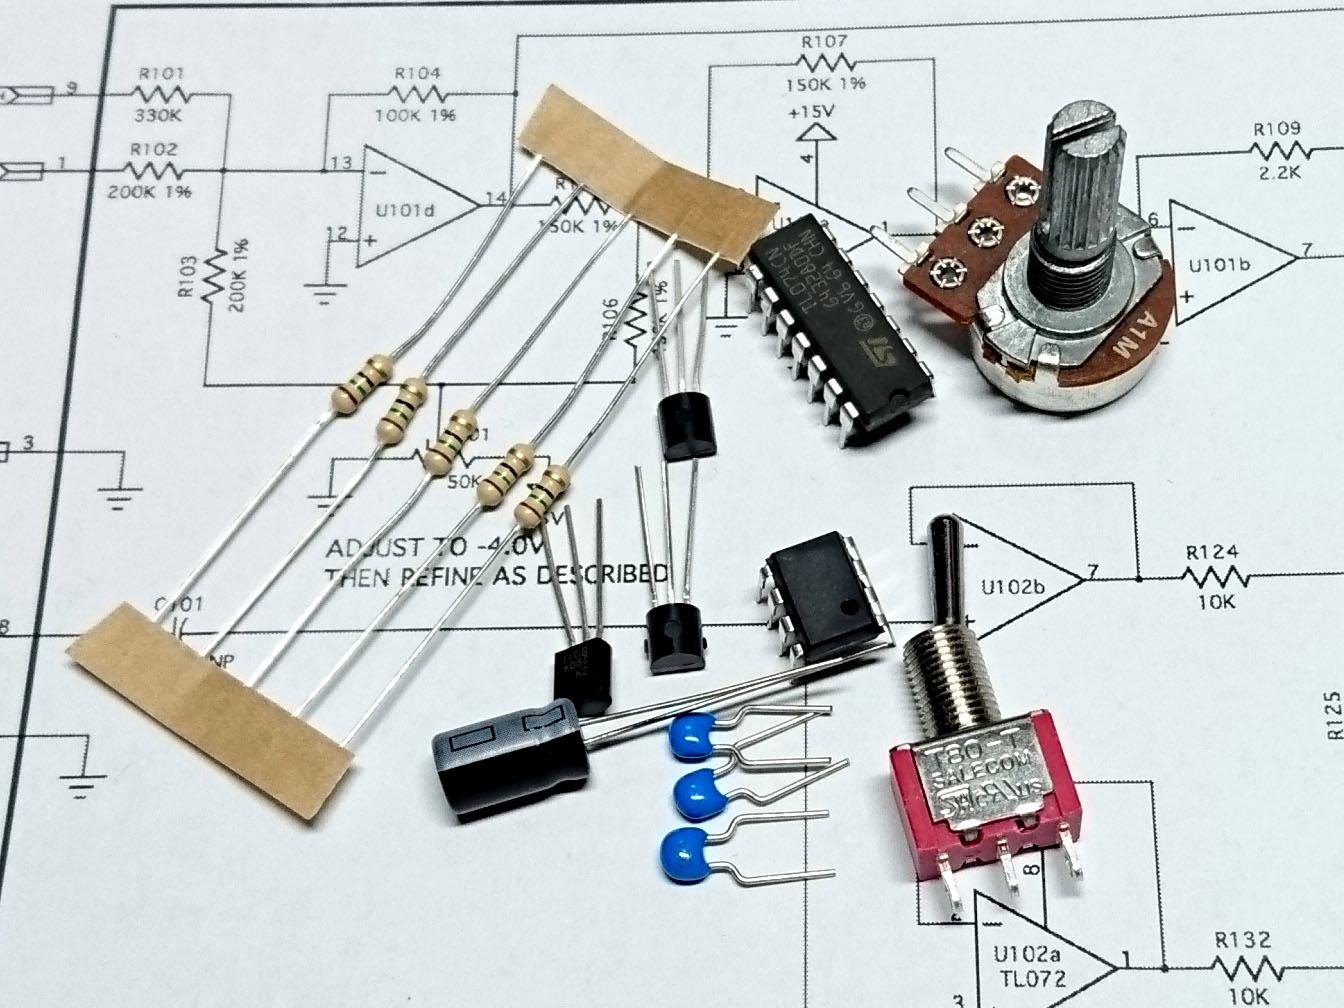 YuSynth MiniMoog Transistor Ladder VCF Module Bare Electronics Parts Kit